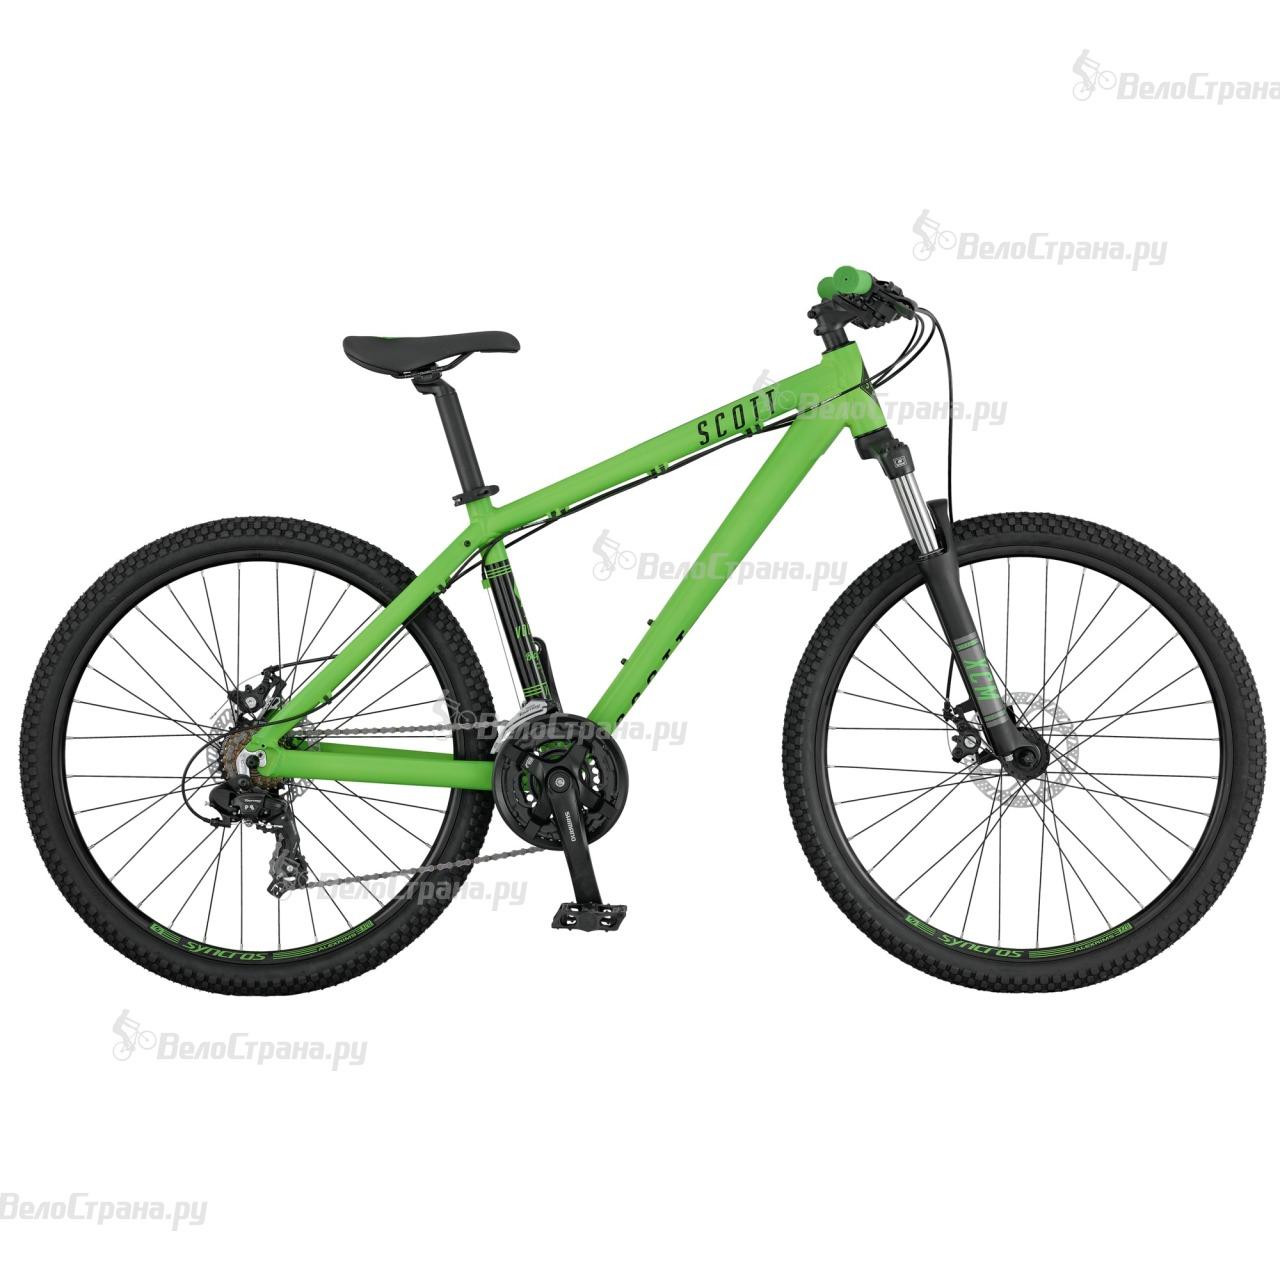 Велосипед Scott Voltage YZ 20 (2017)  цены